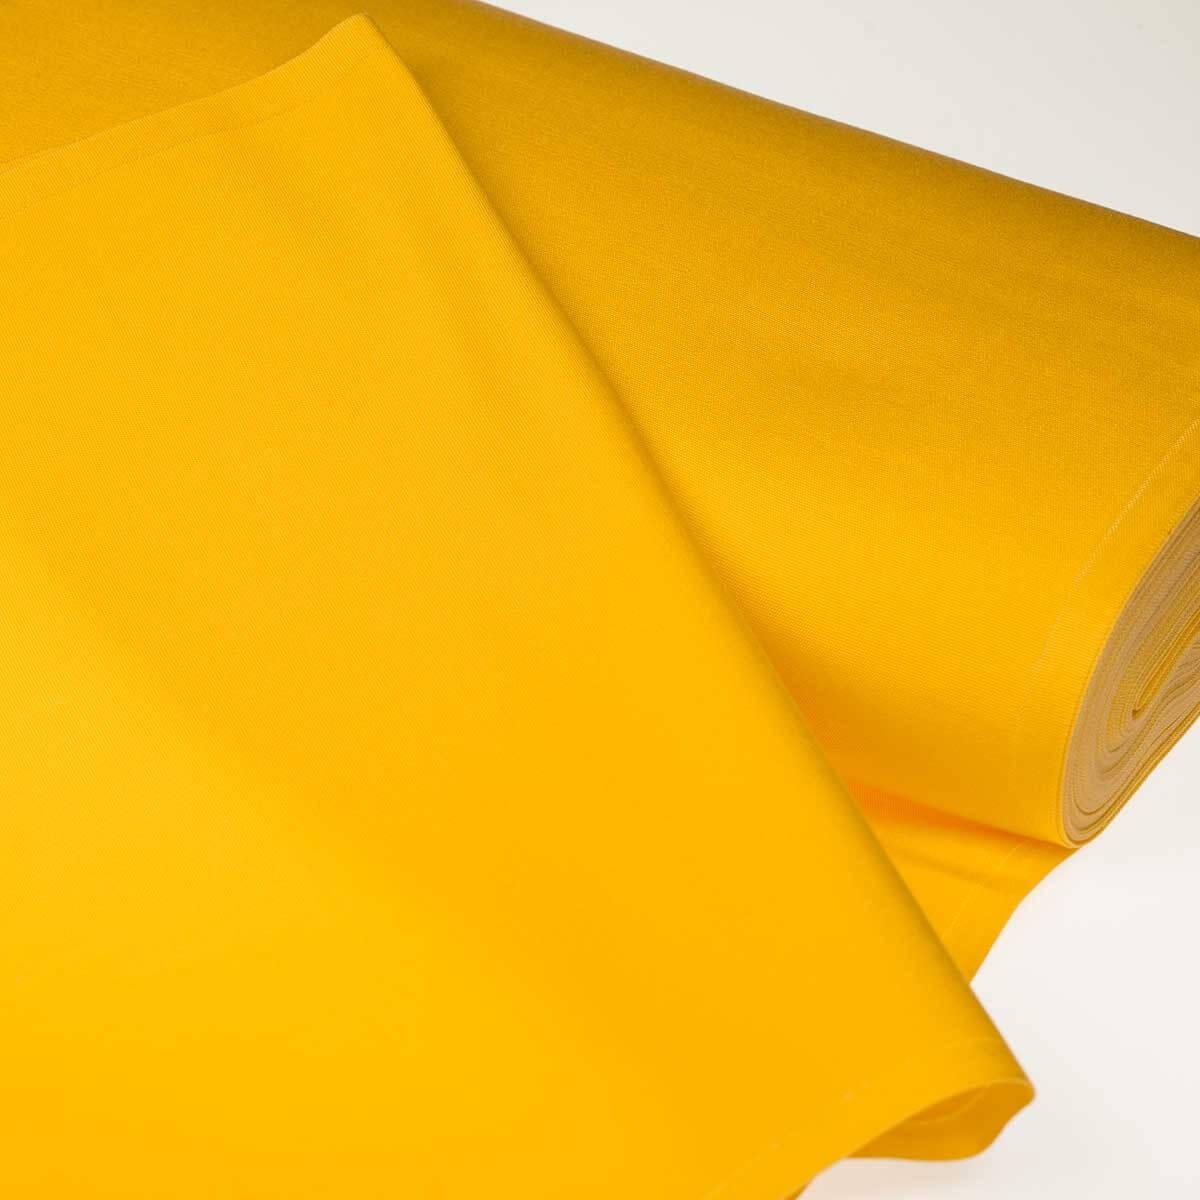 toile transat outdoor uni 150cm x 43cm jaune. Black Bedroom Furniture Sets. Home Design Ideas